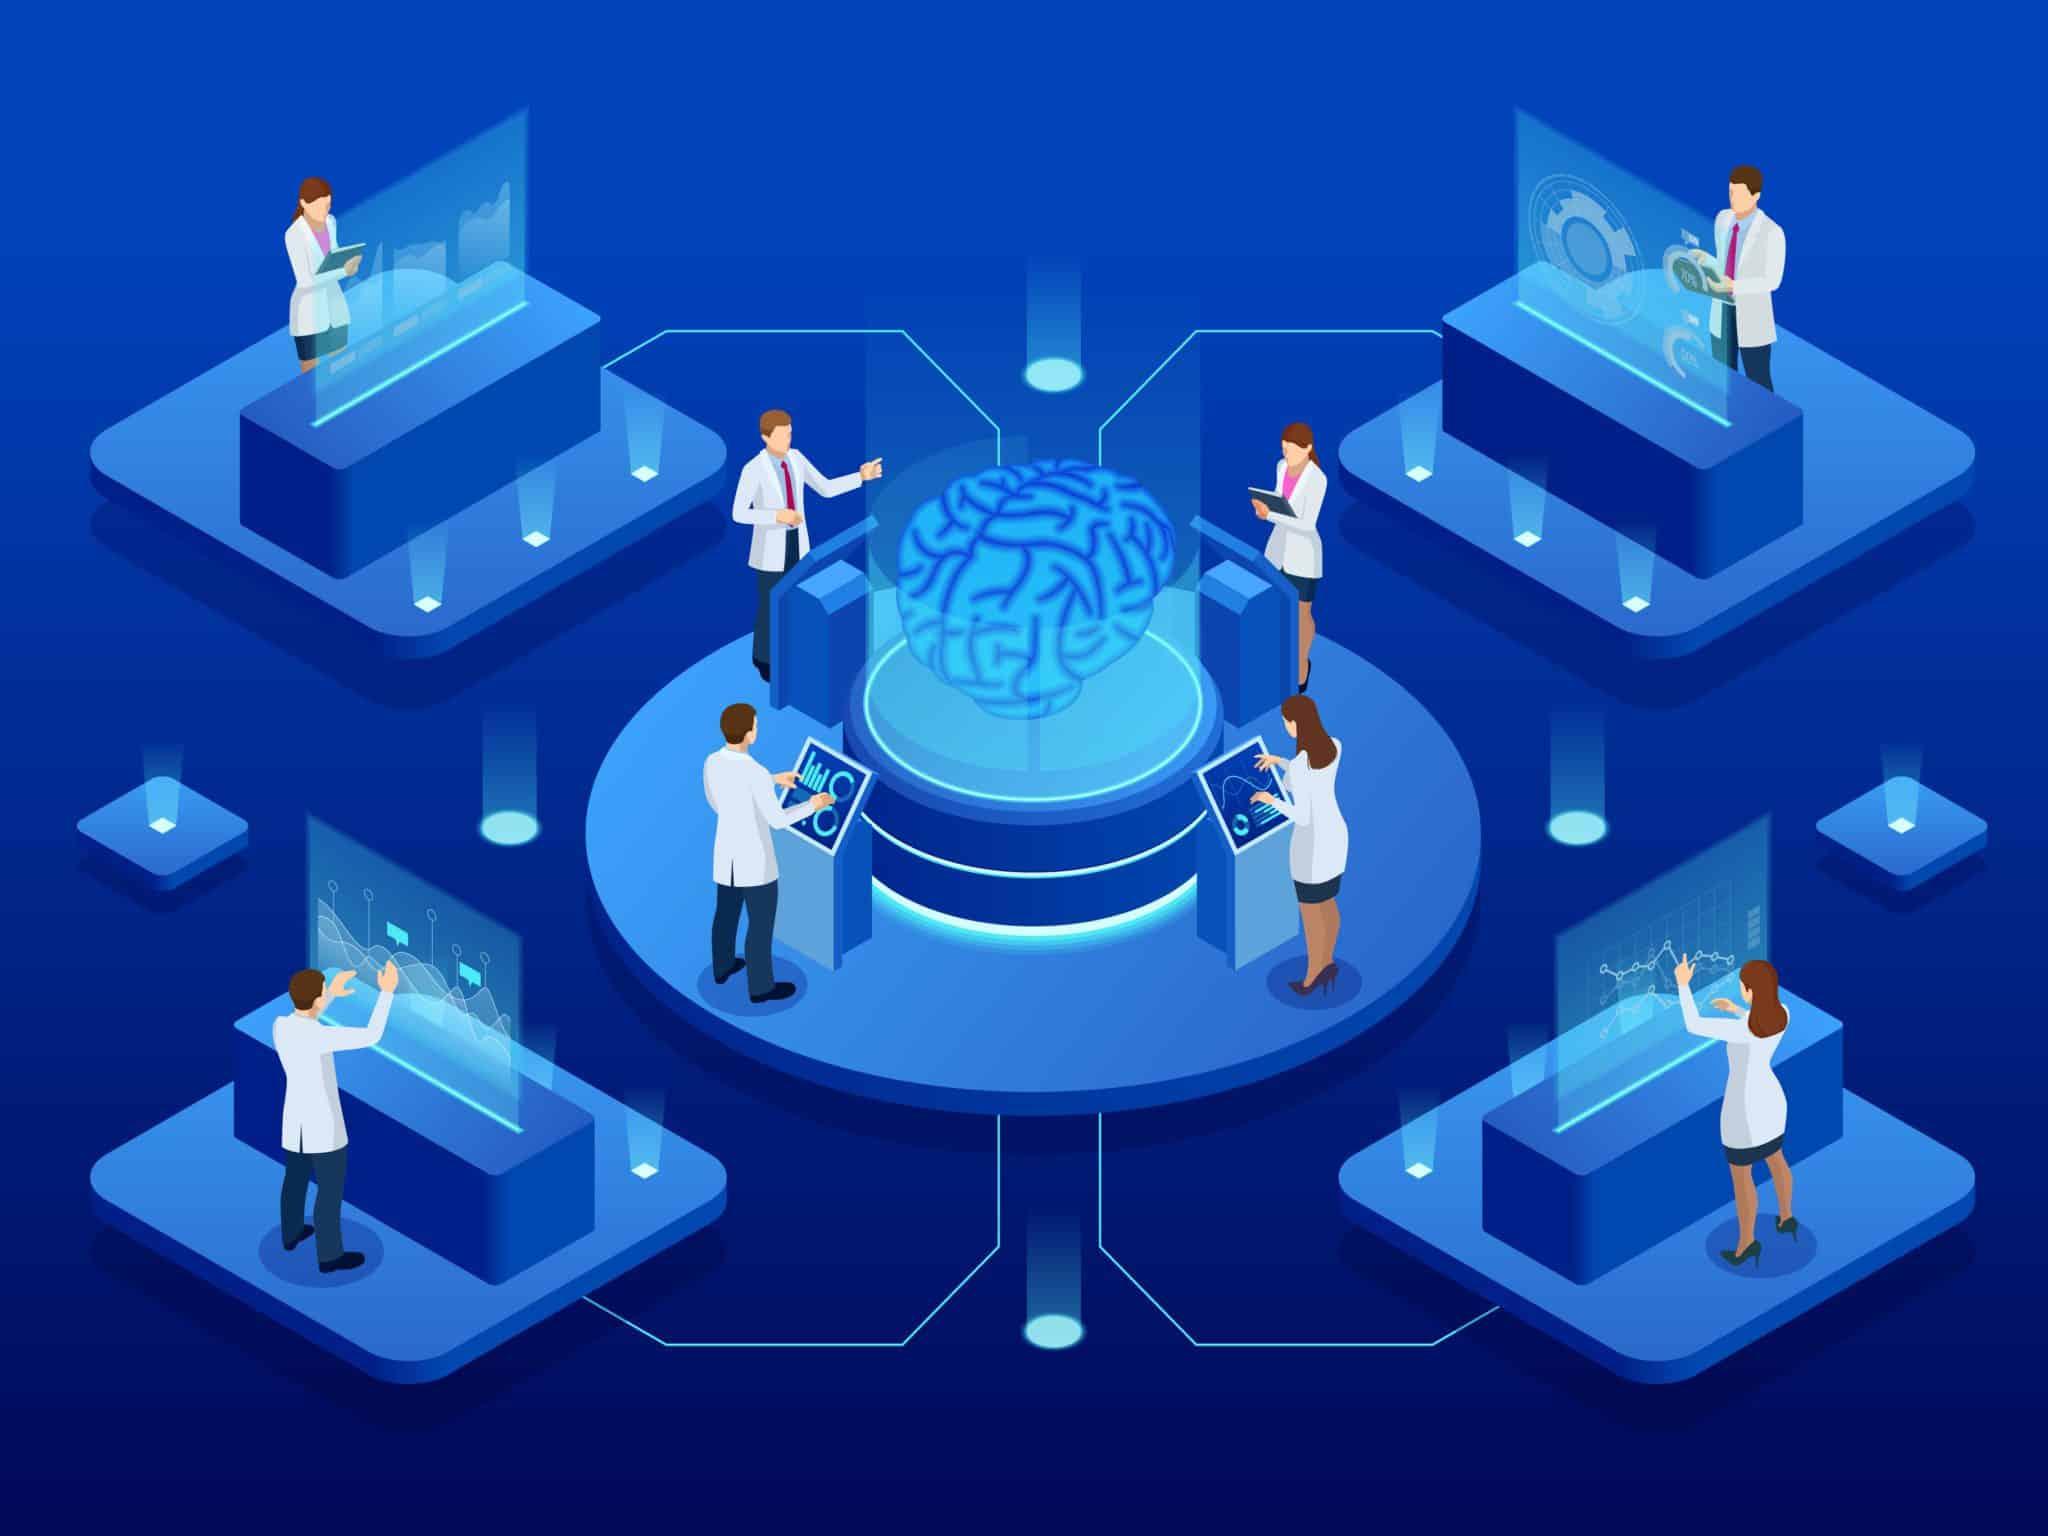 Researchers working around a brain